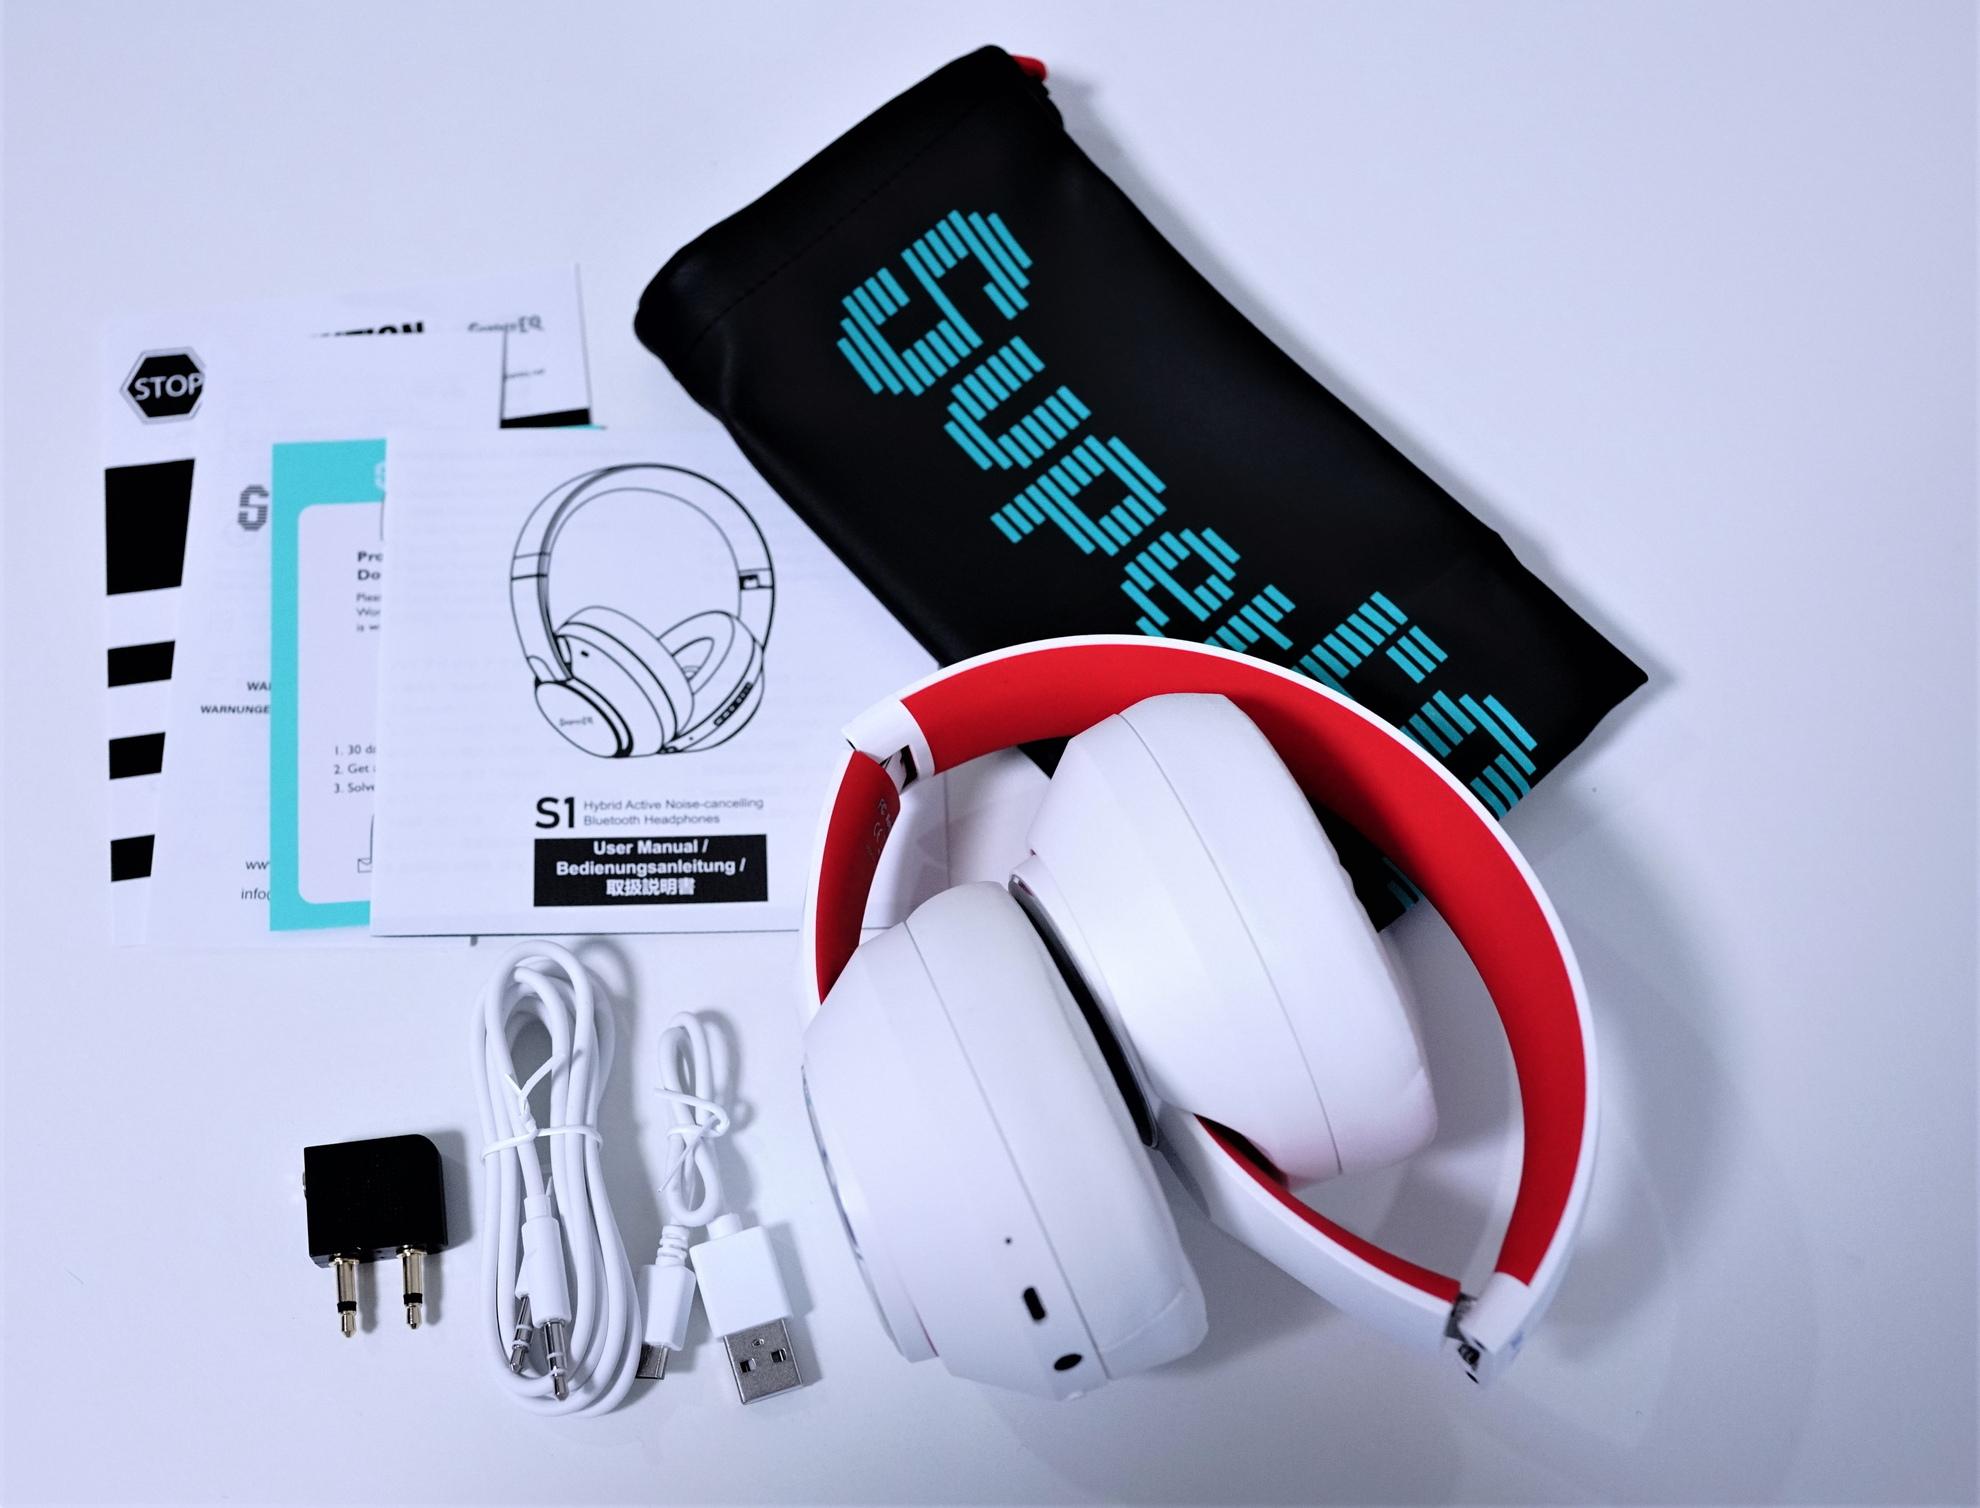 SuperEQ S1 Bluetoothヘッドフォンレビュー パッケージ内容